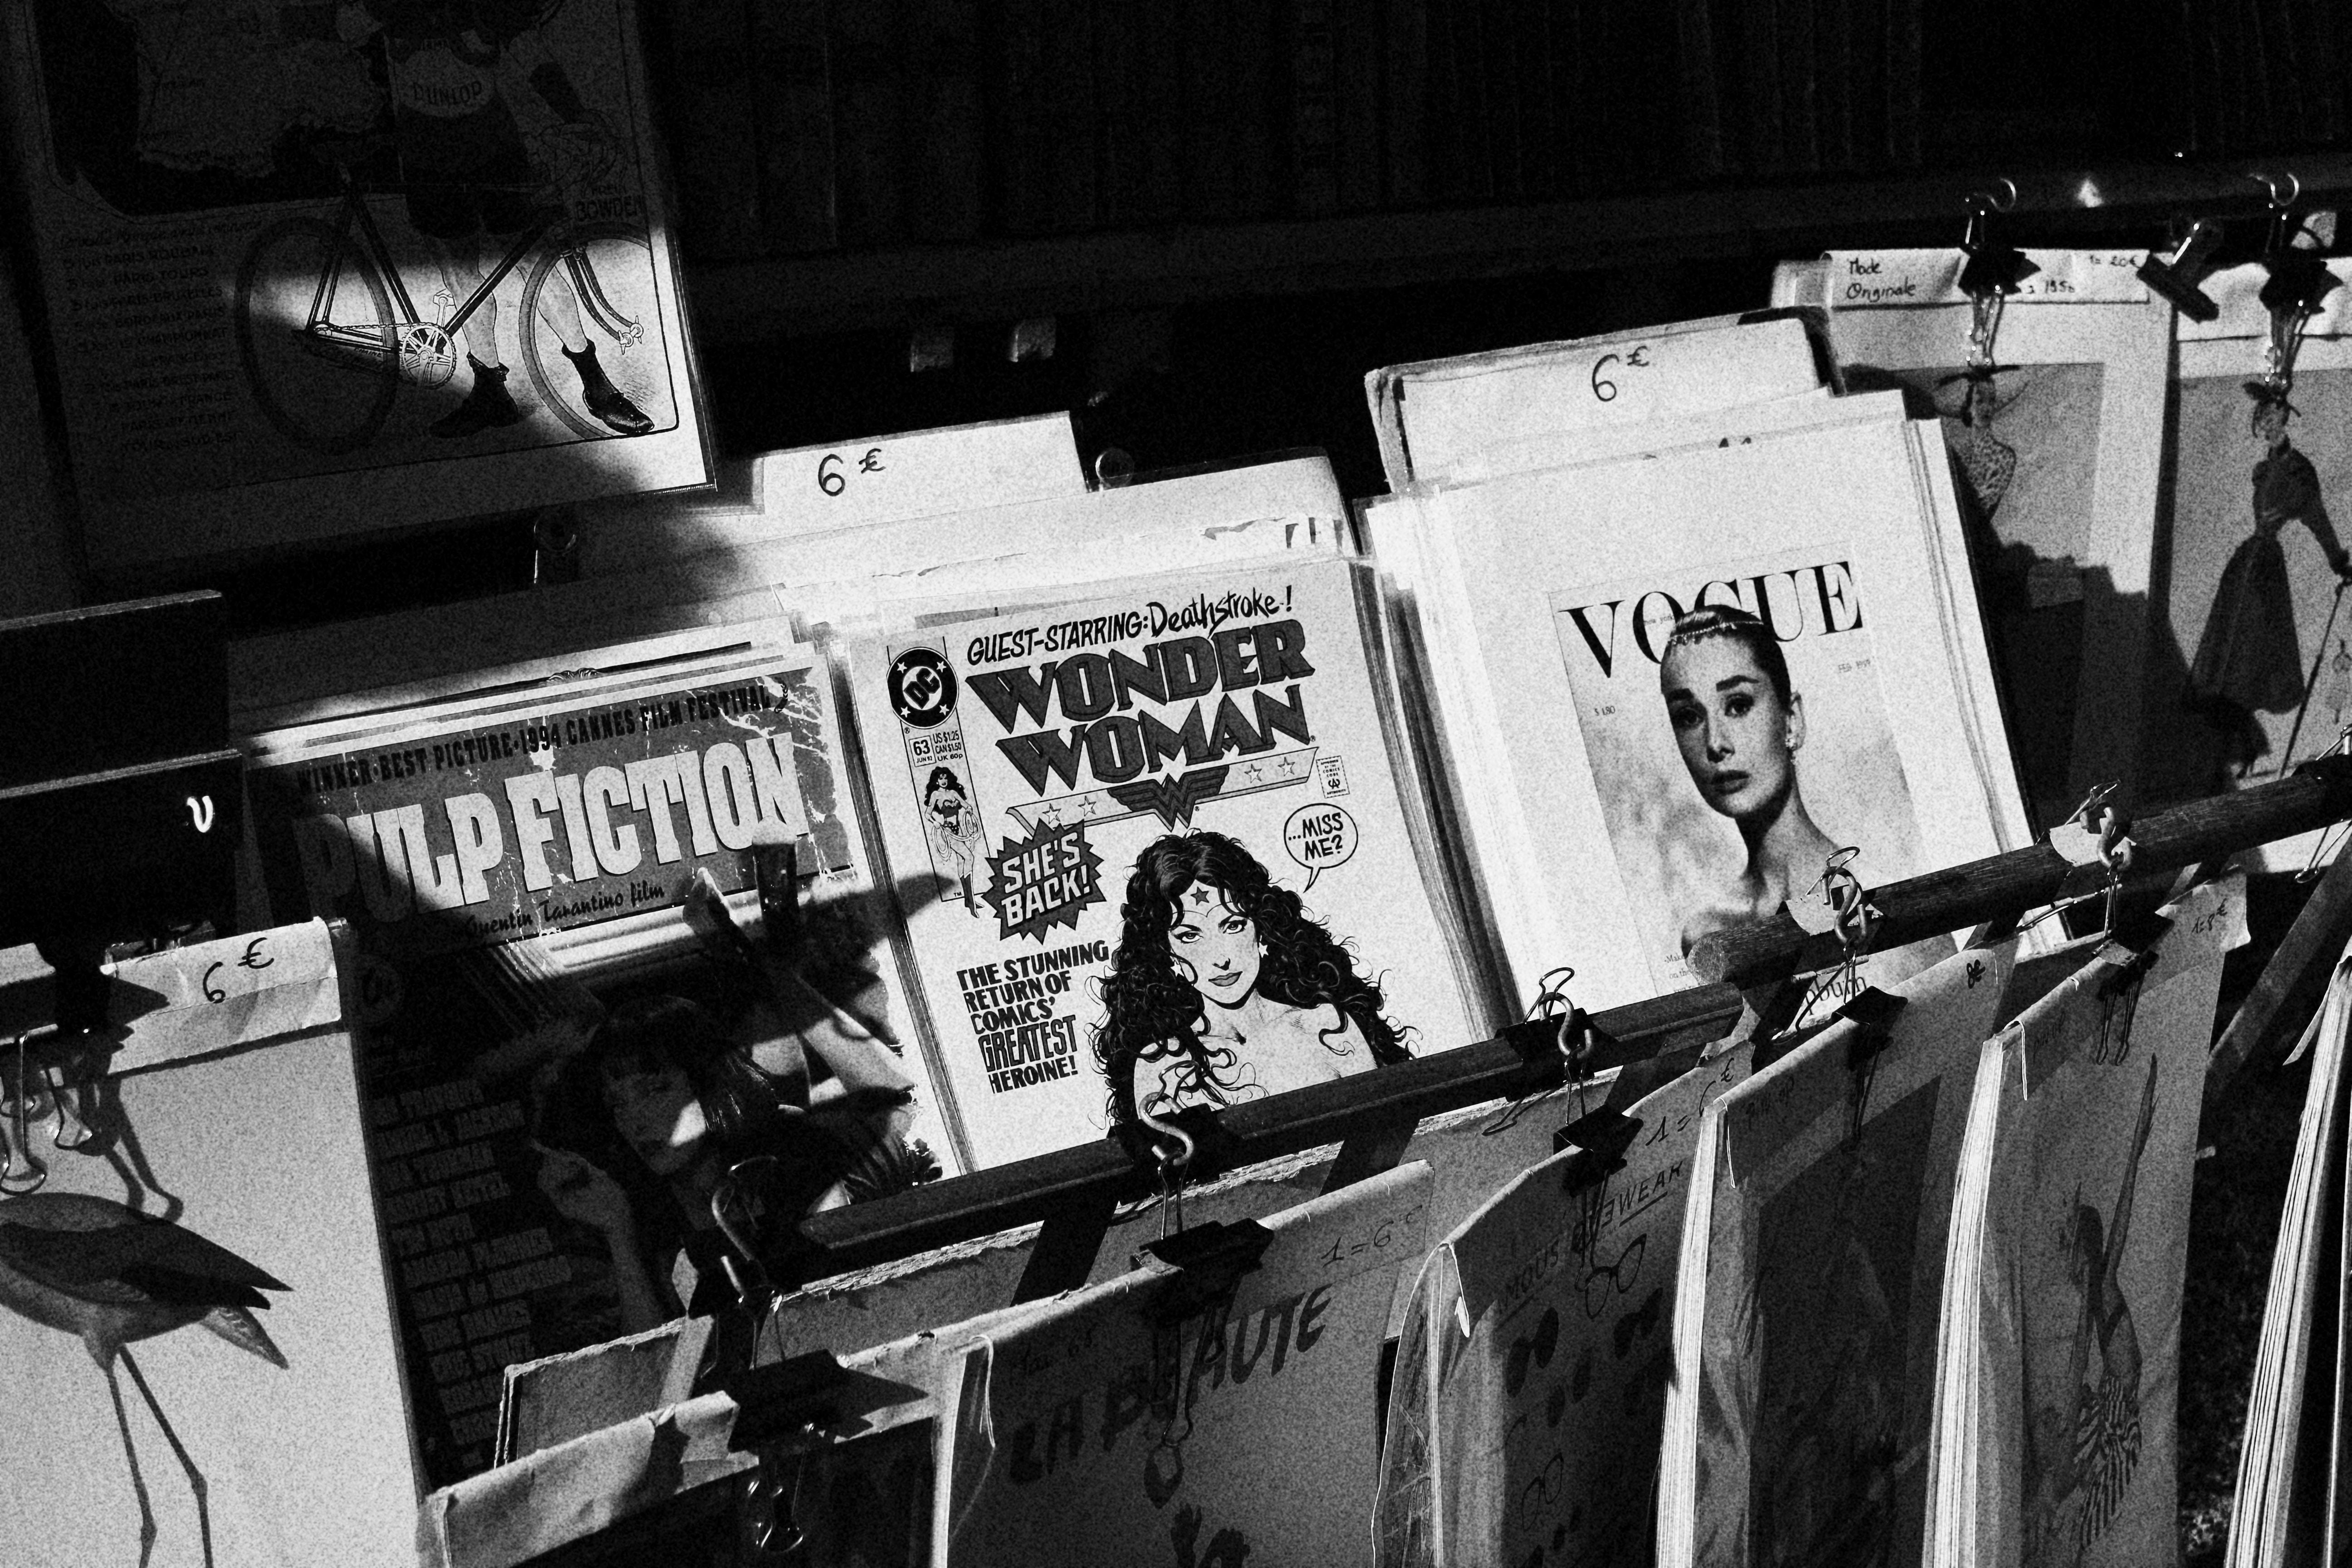 grayscale photo of magazines on rack